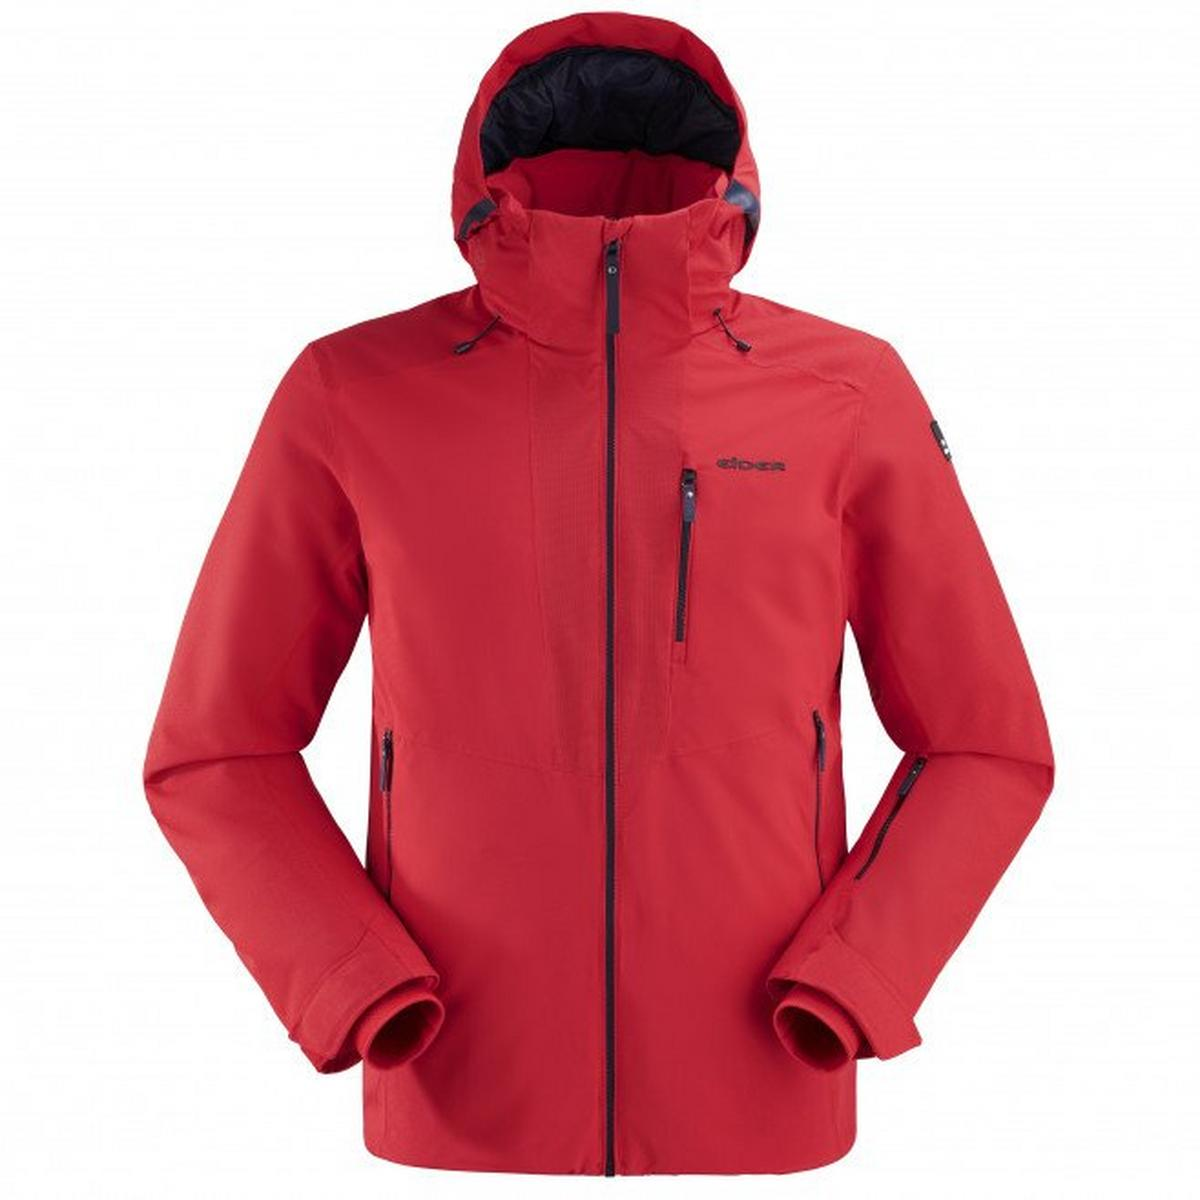 Eider Ridge Jacket 3.0